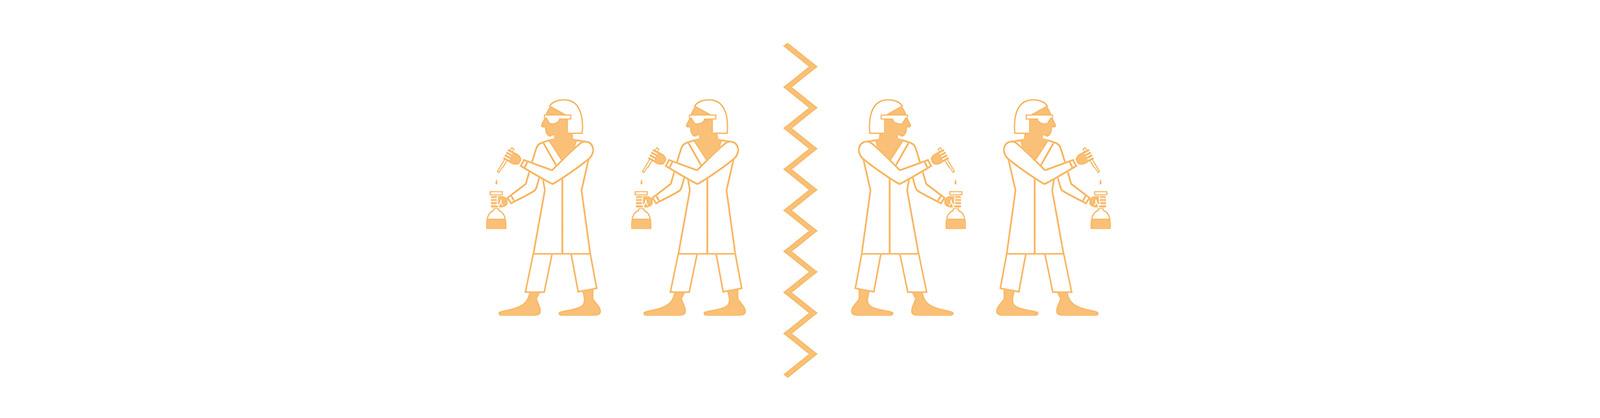 esLebeDerKoenig_hieroglyphe_05